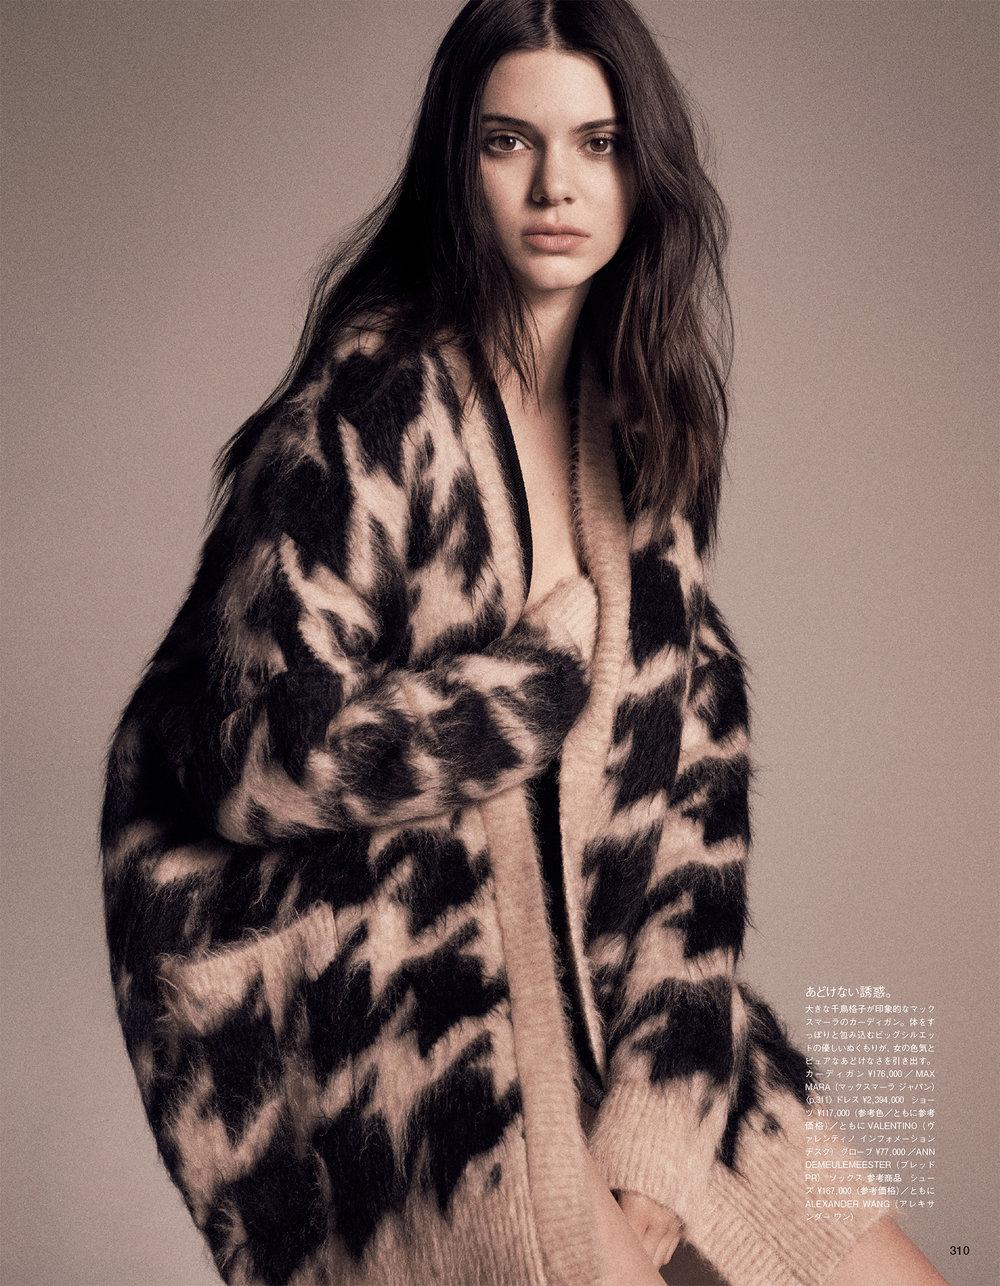 Giovanna-Battaglia-Vogue-Japan-November-2015-Cool-As-Kendall-Patrick-Demarchelier-Kendall-Jenner-6.jpg